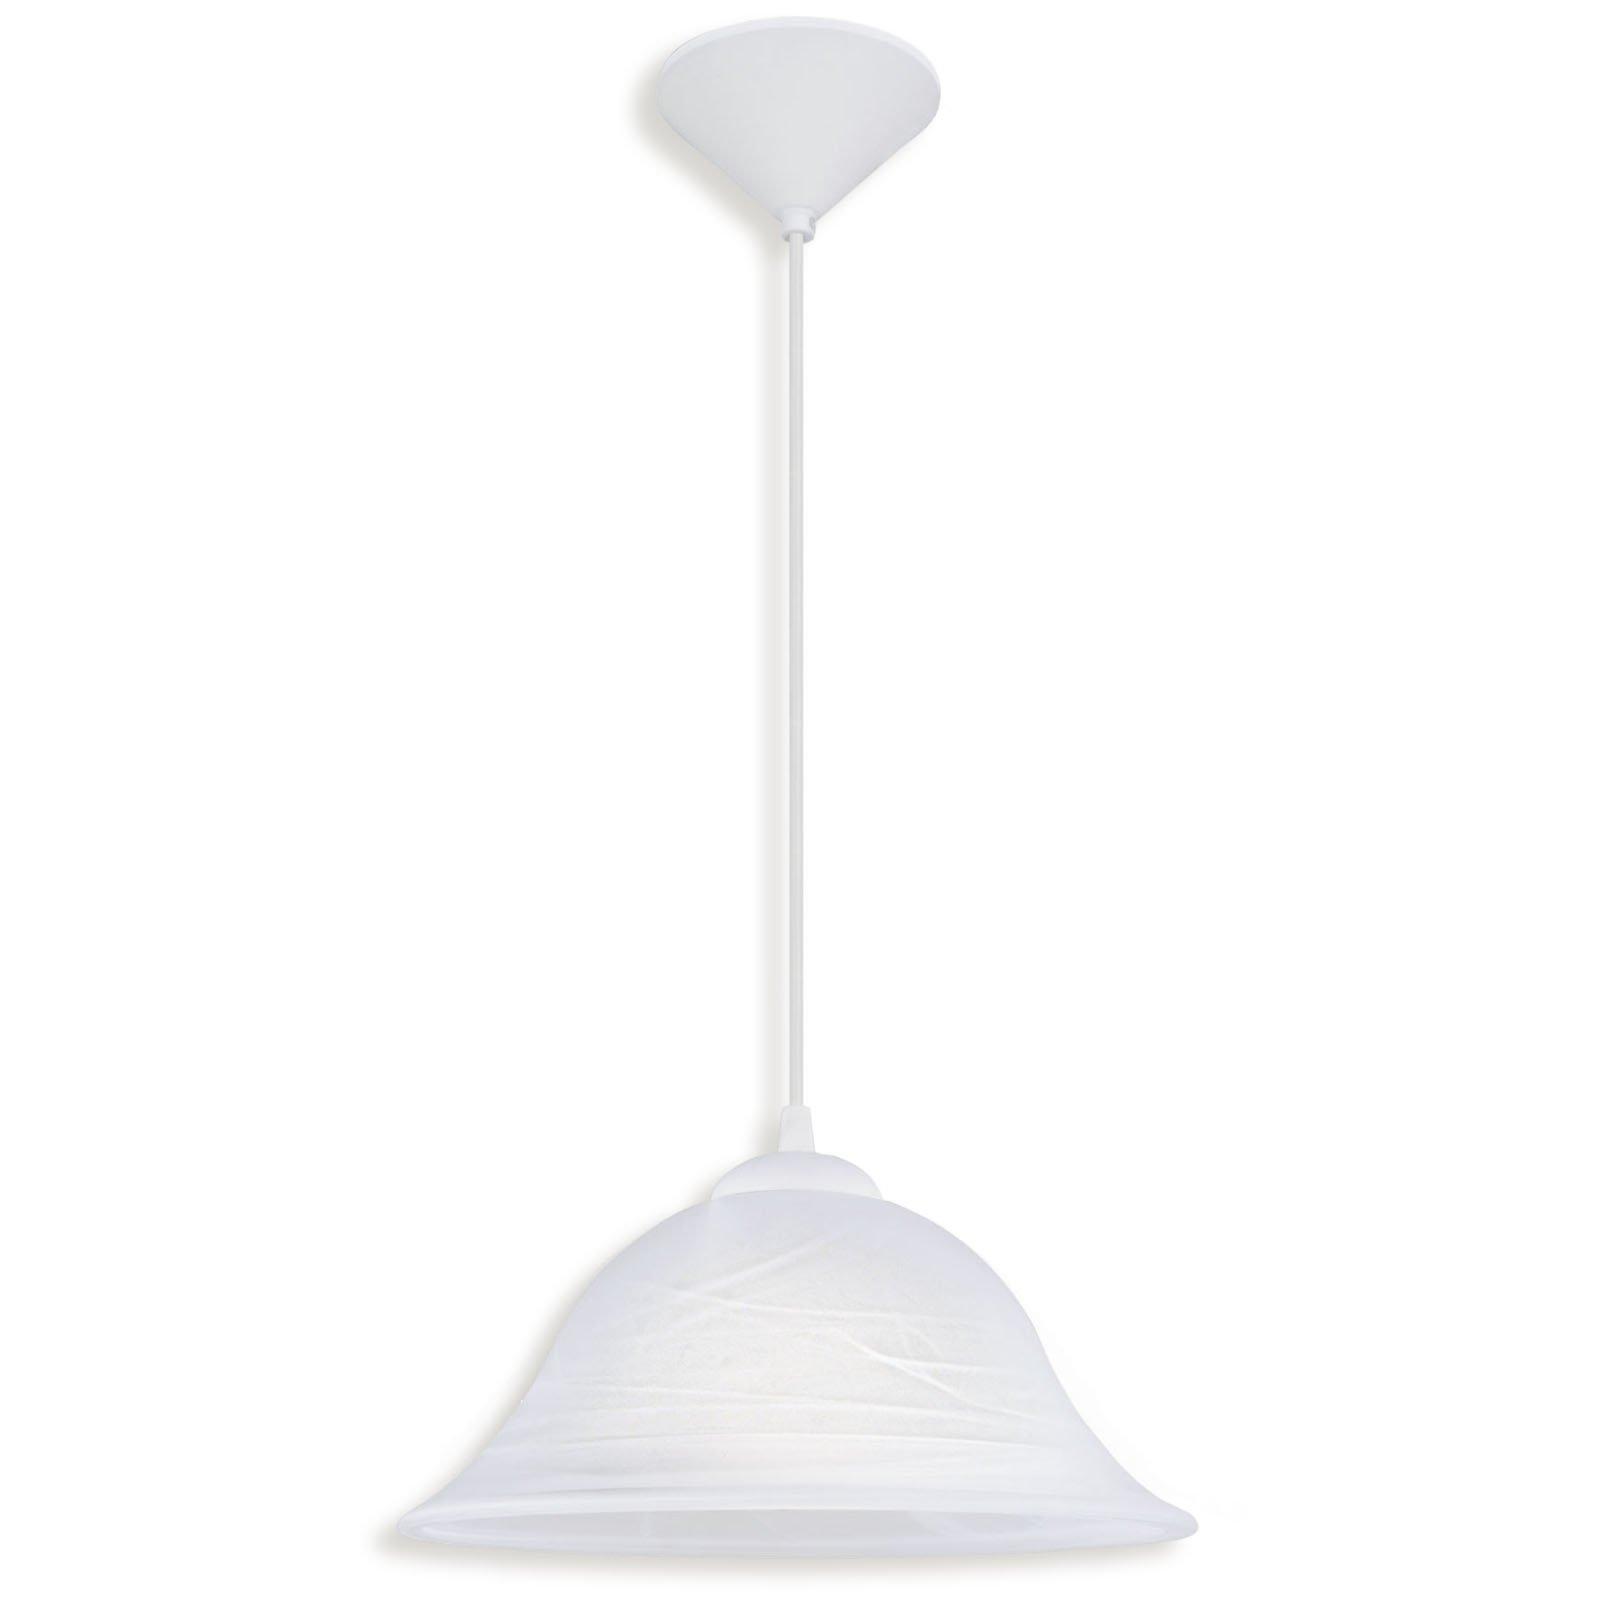 pendelleuchte alessandra wei glas marmoriert pendelleuchten h ngelampen lampen. Black Bedroom Furniture Sets. Home Design Ideas